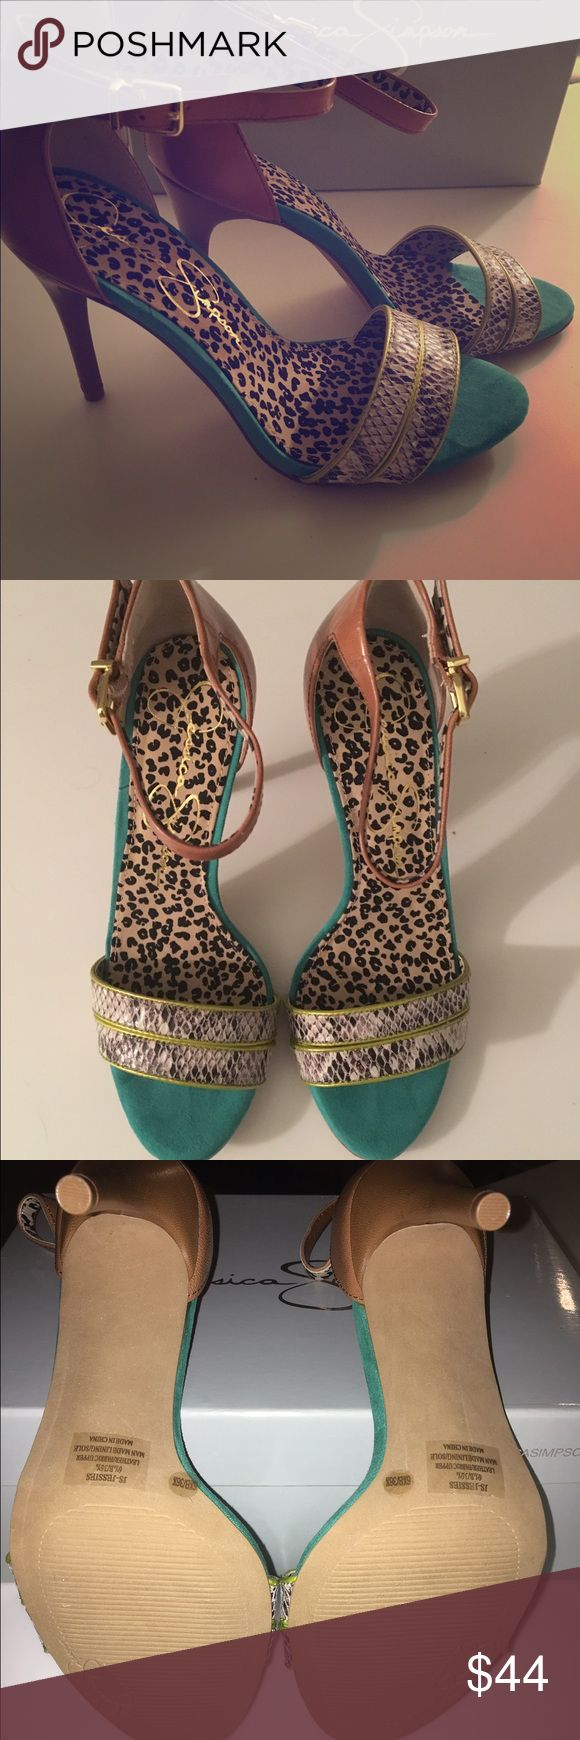 Jessica Simpson heels Brand new never worn Jessica Simpson heels. Jessica Simpson Shoes Heels